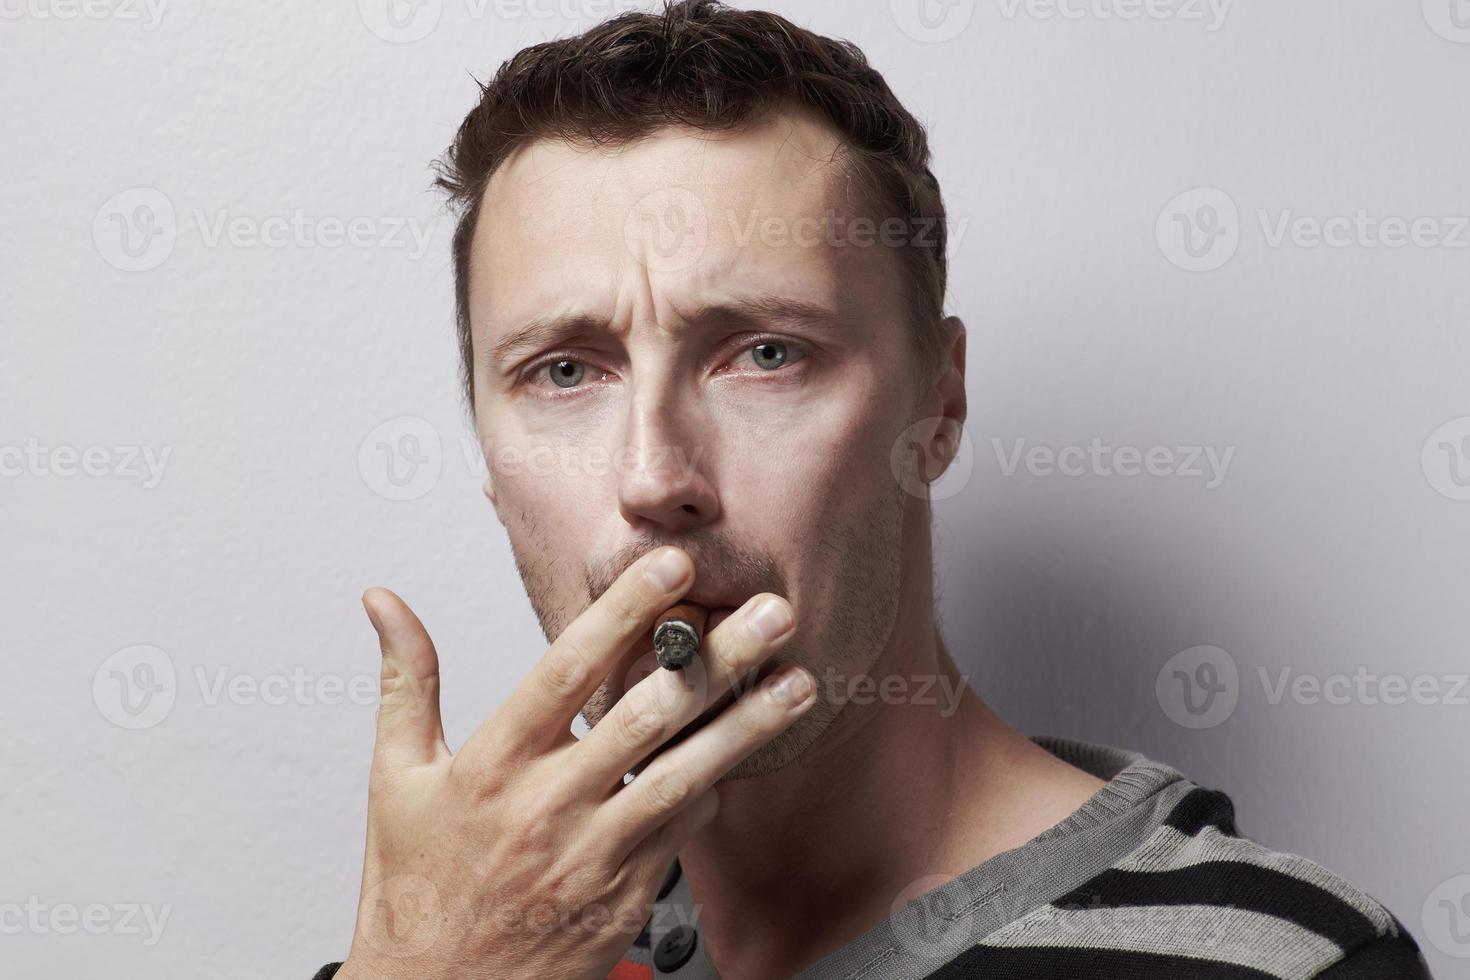 kaukasisk manstående med cigarr foto